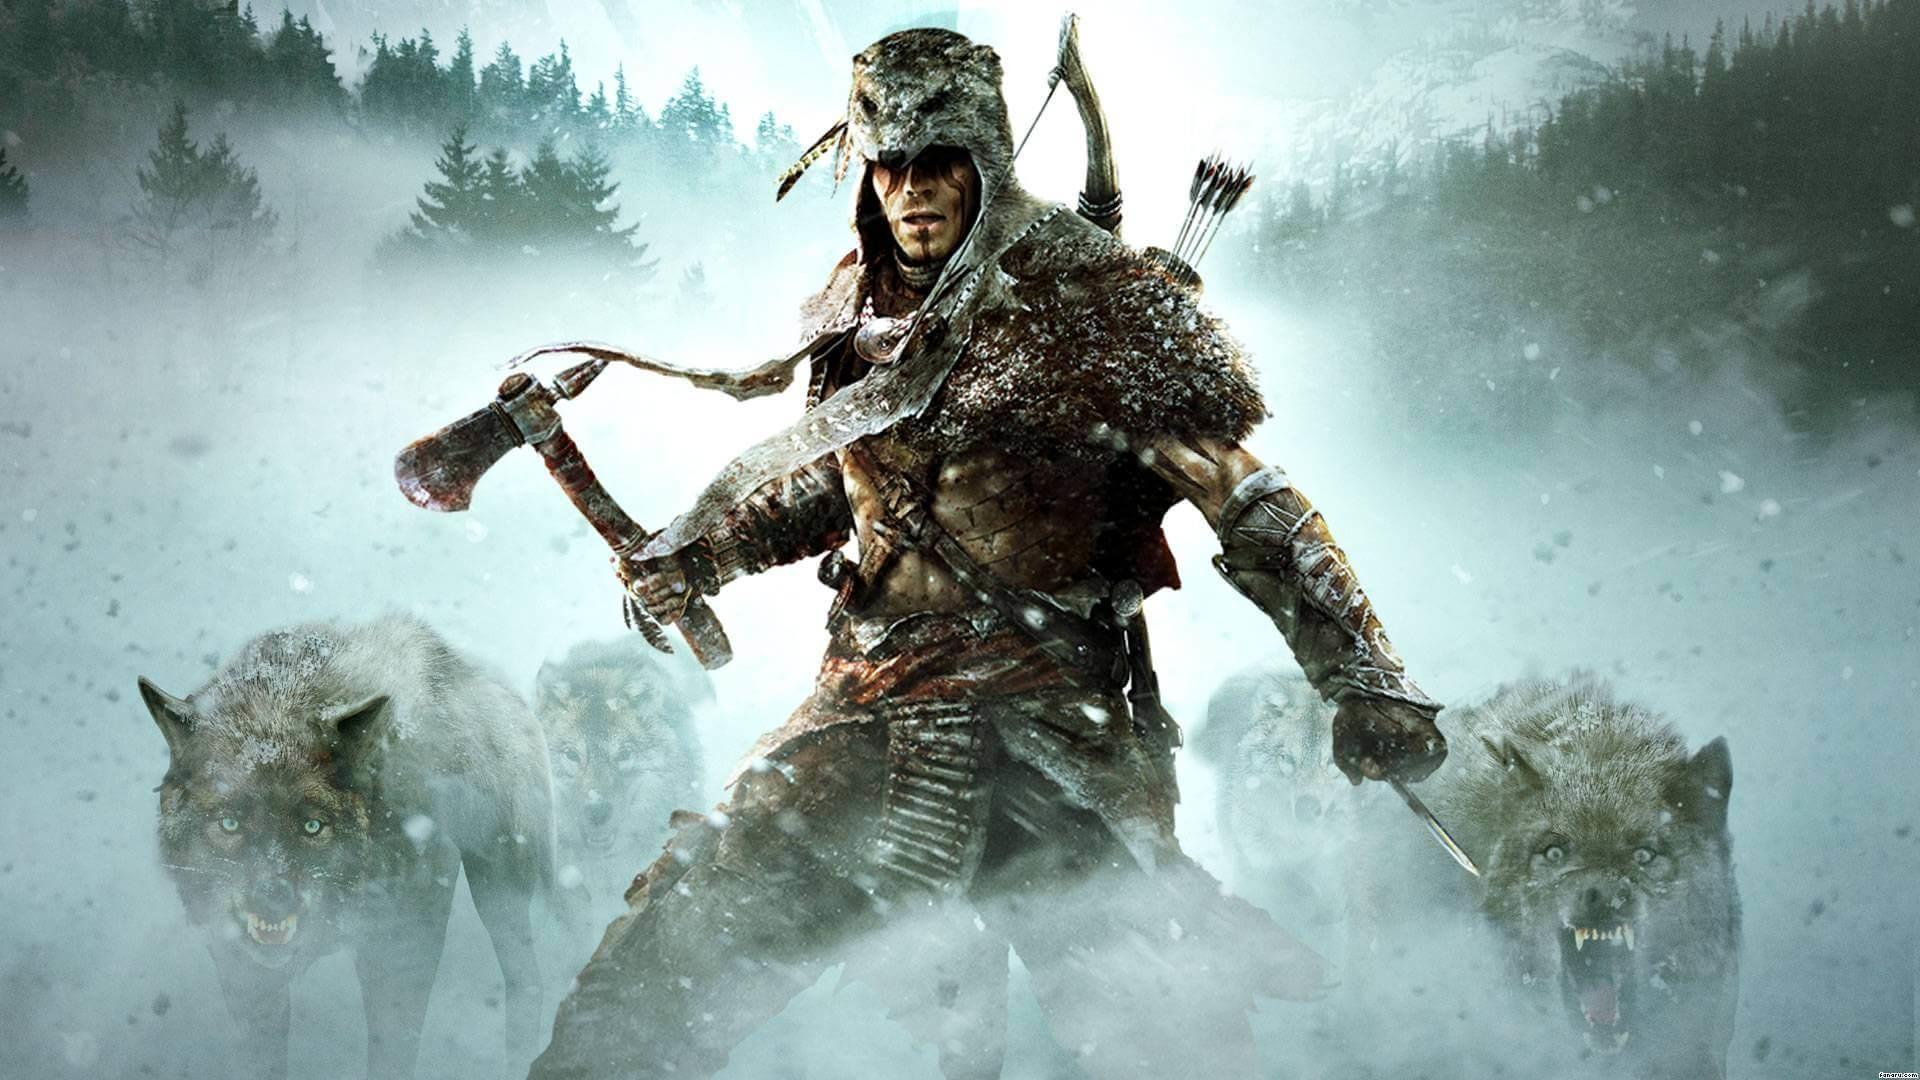 Assassins Creed Rogue Wallpaper 1080p 76 Images